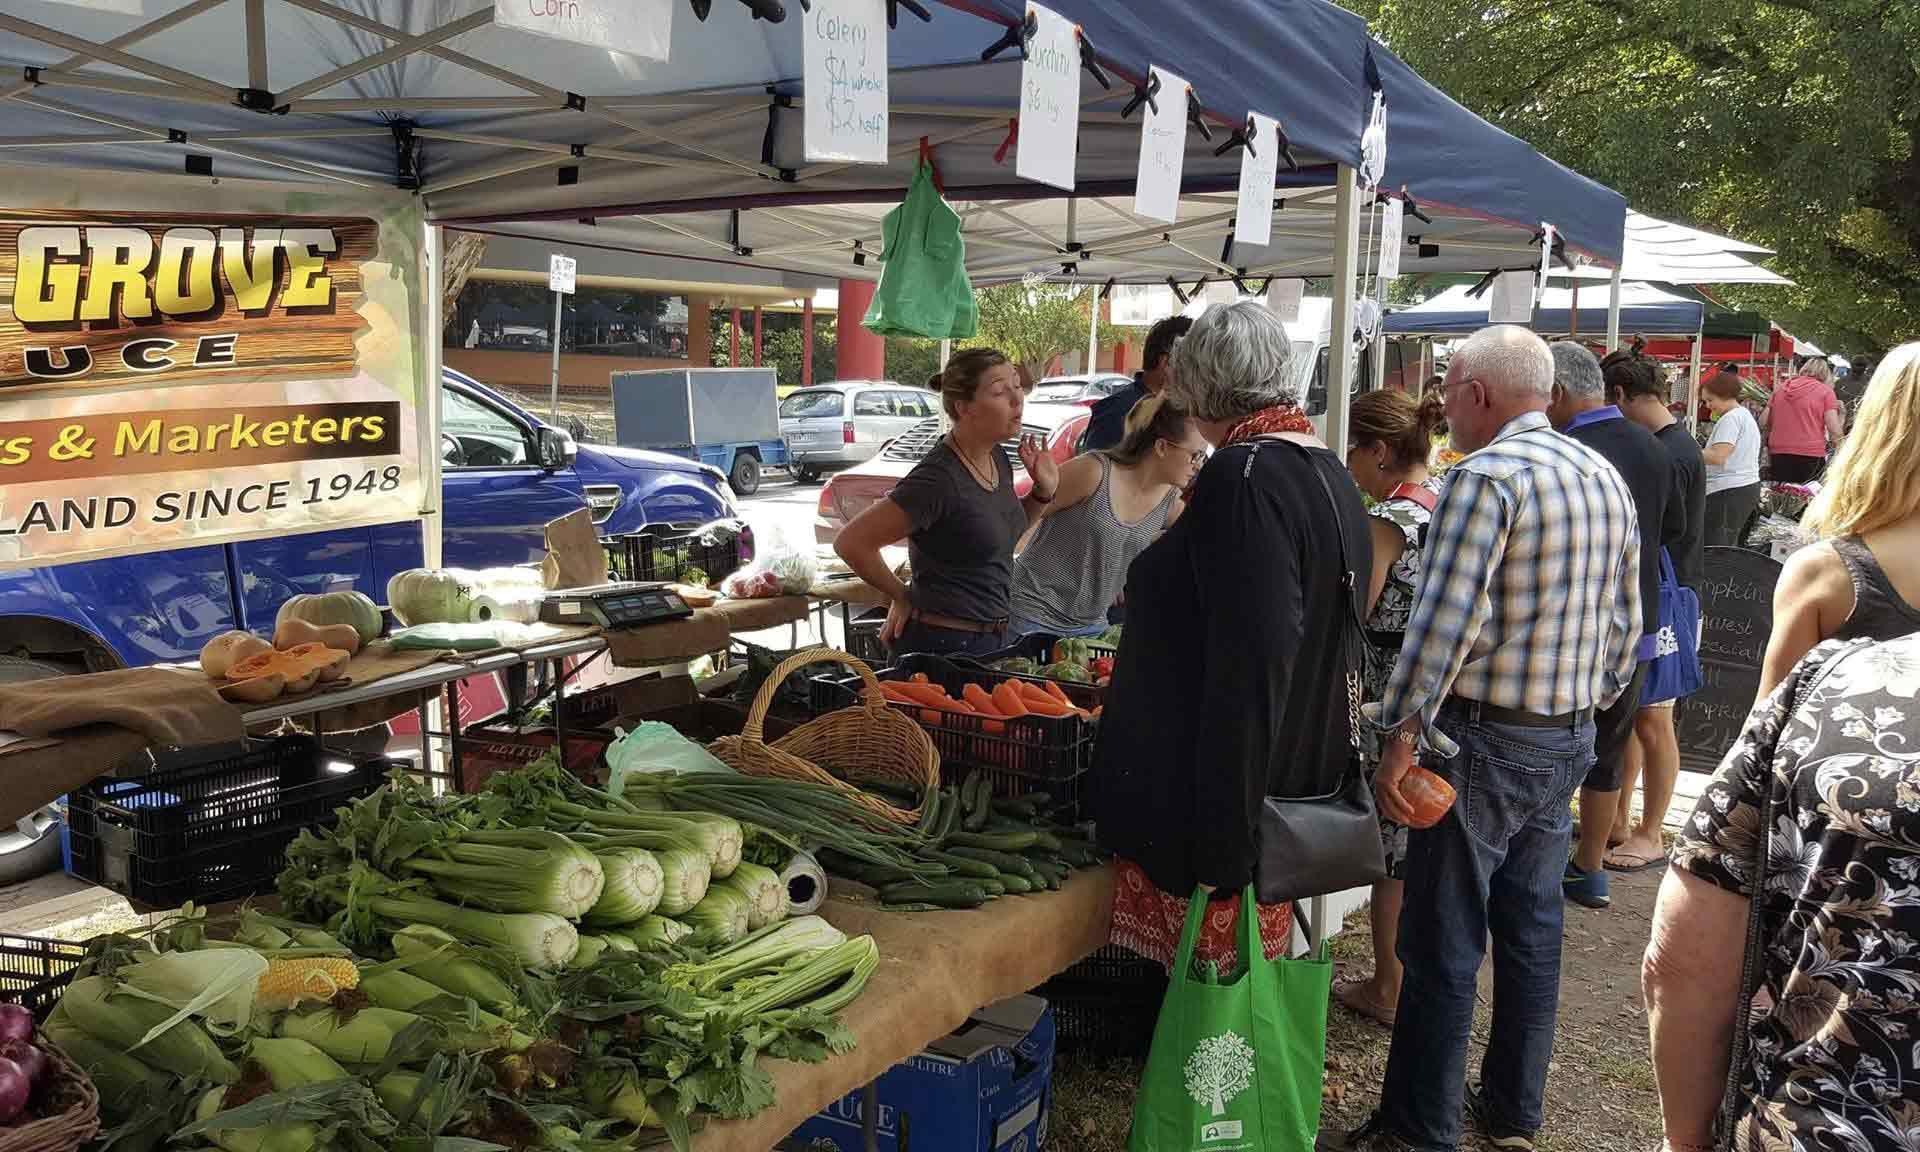 Image courtesy Traralgon Farmers Market